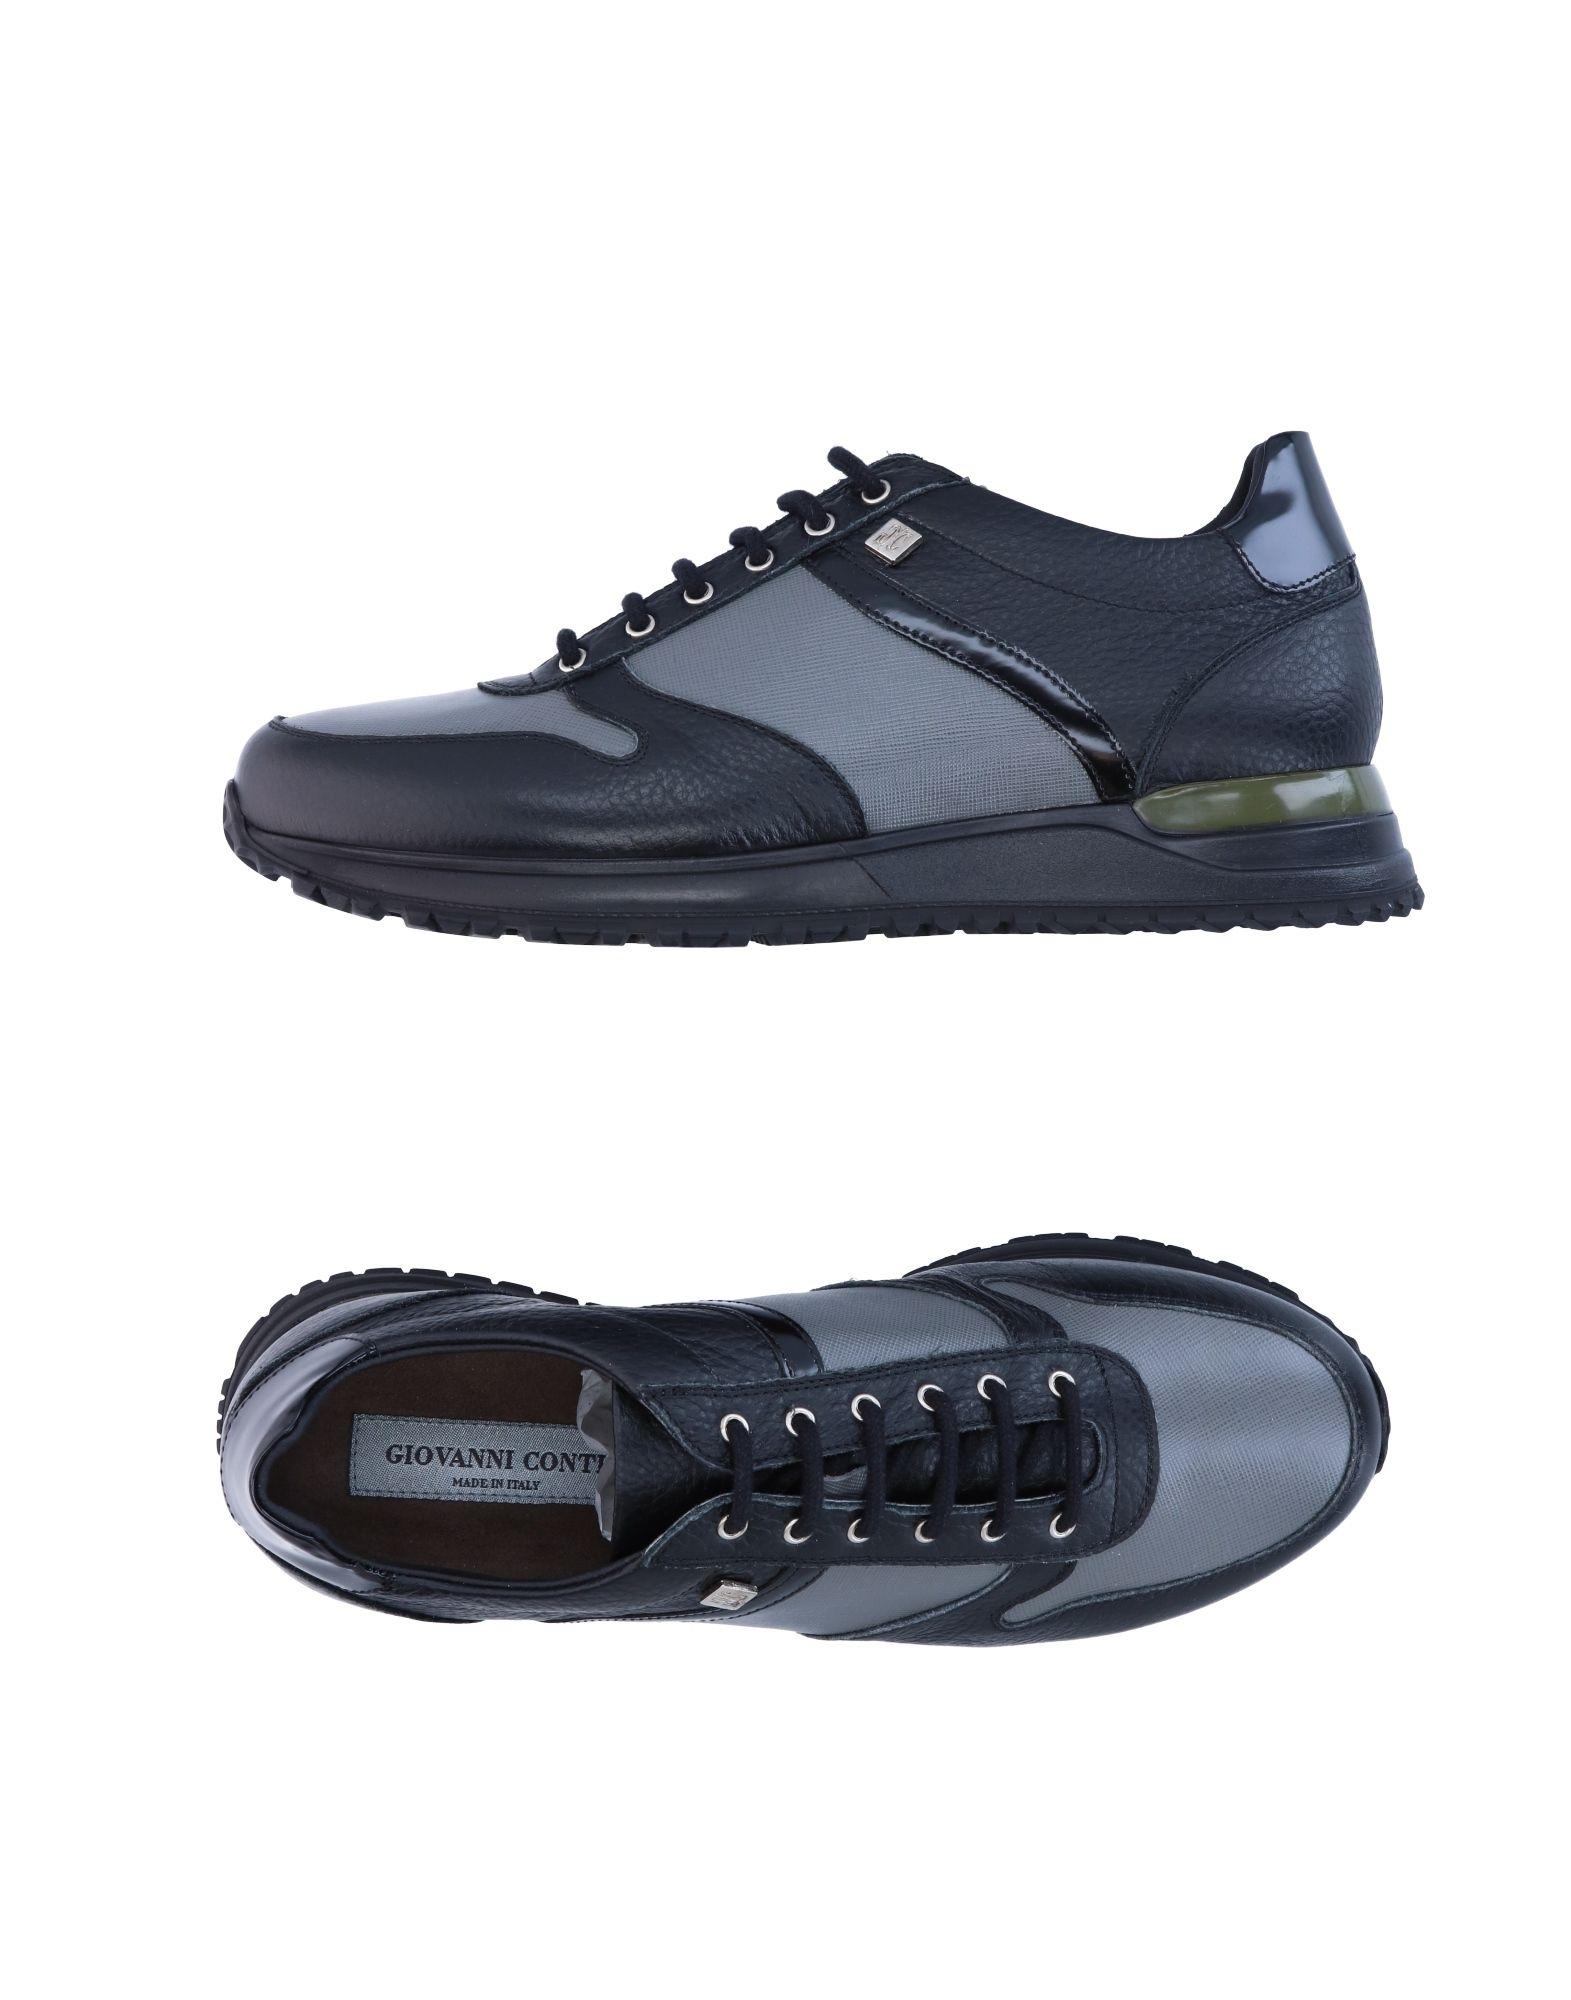 Giovanni Conti Sneakers Herren  11292956KW 11292956KW  7337c3